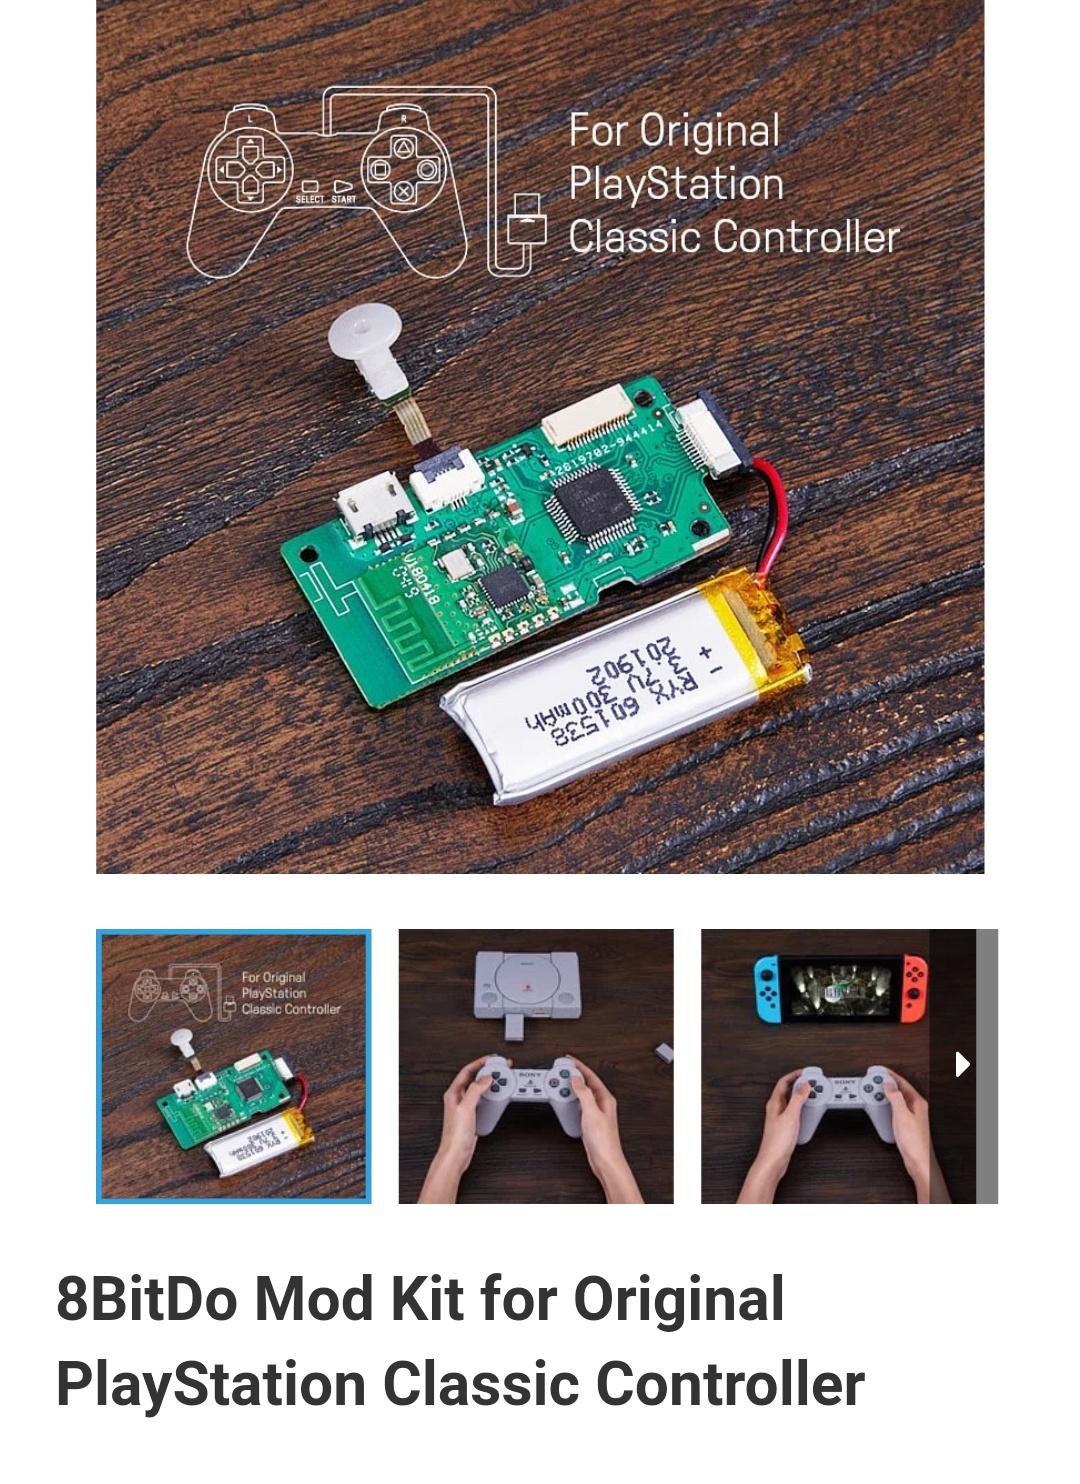 8Bitdo-Diy-Mod Kit-Playstation-Classic-Belchine-1